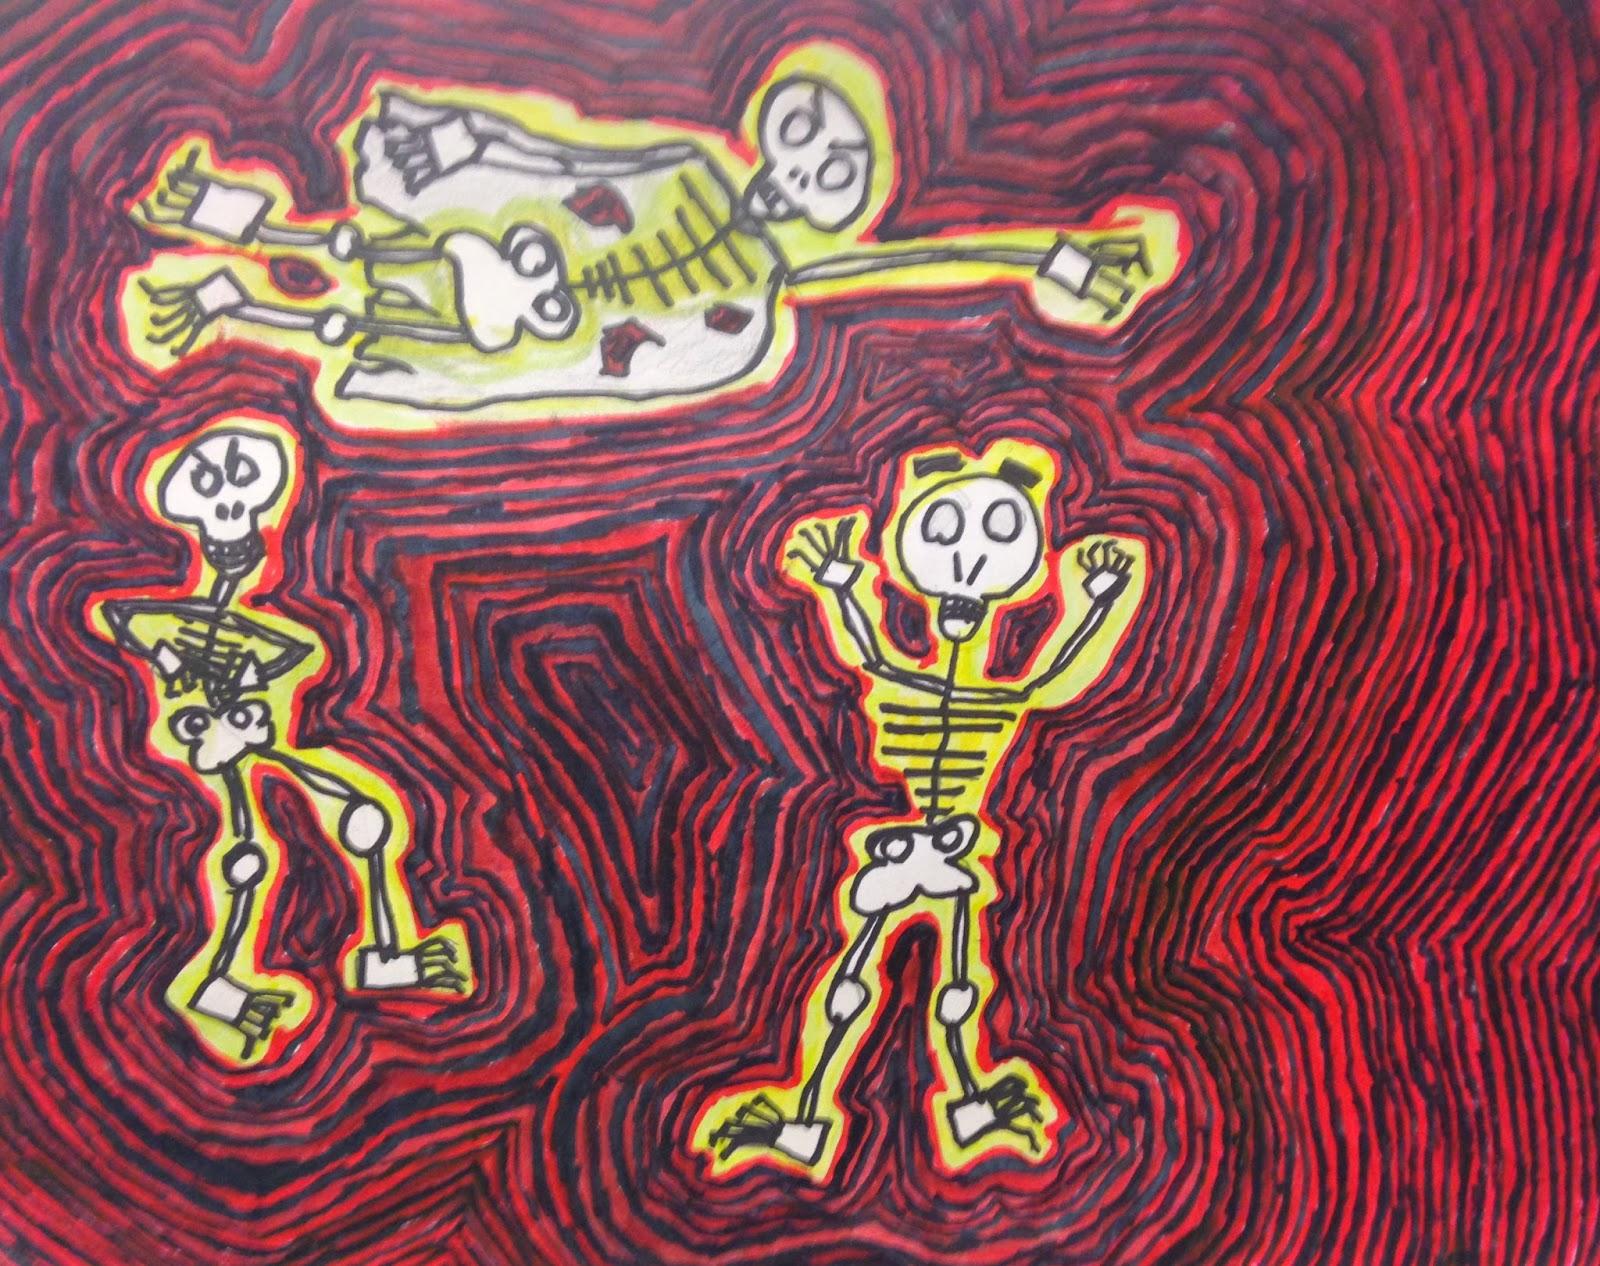 Art Room Blog 4th Grade Dancing Skeletons Based On The